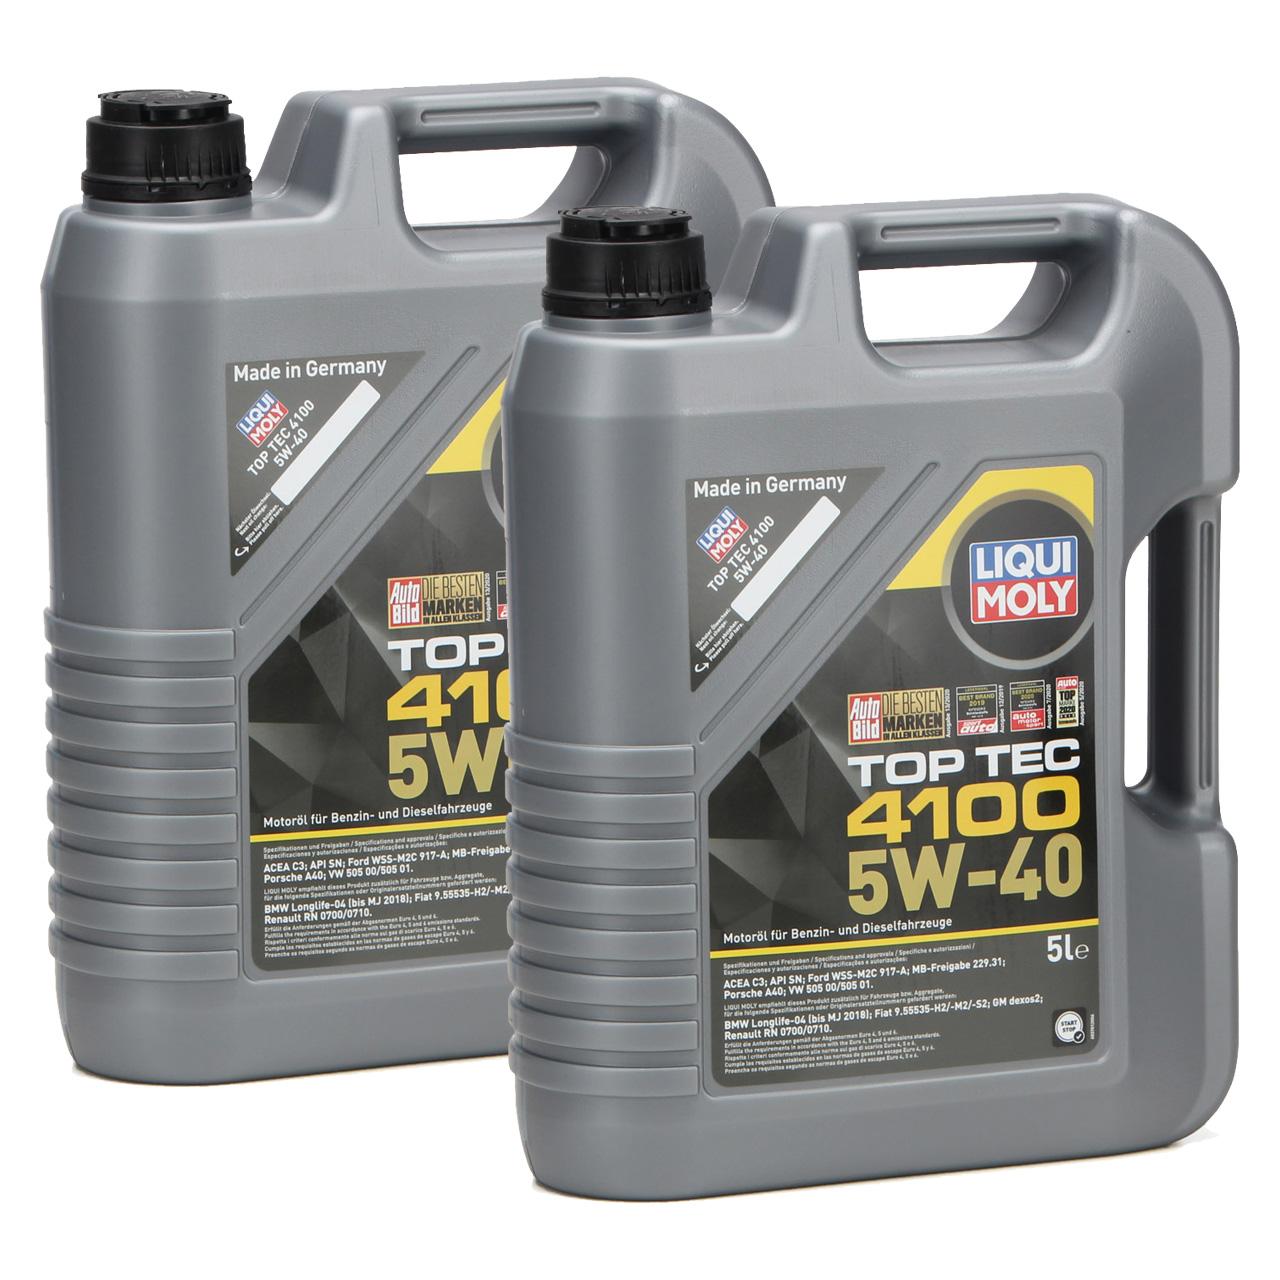 LIQUI MOLY Motoröl Öl TOP TEC 4100 5W40 5W-40 10L 10Liter 3701